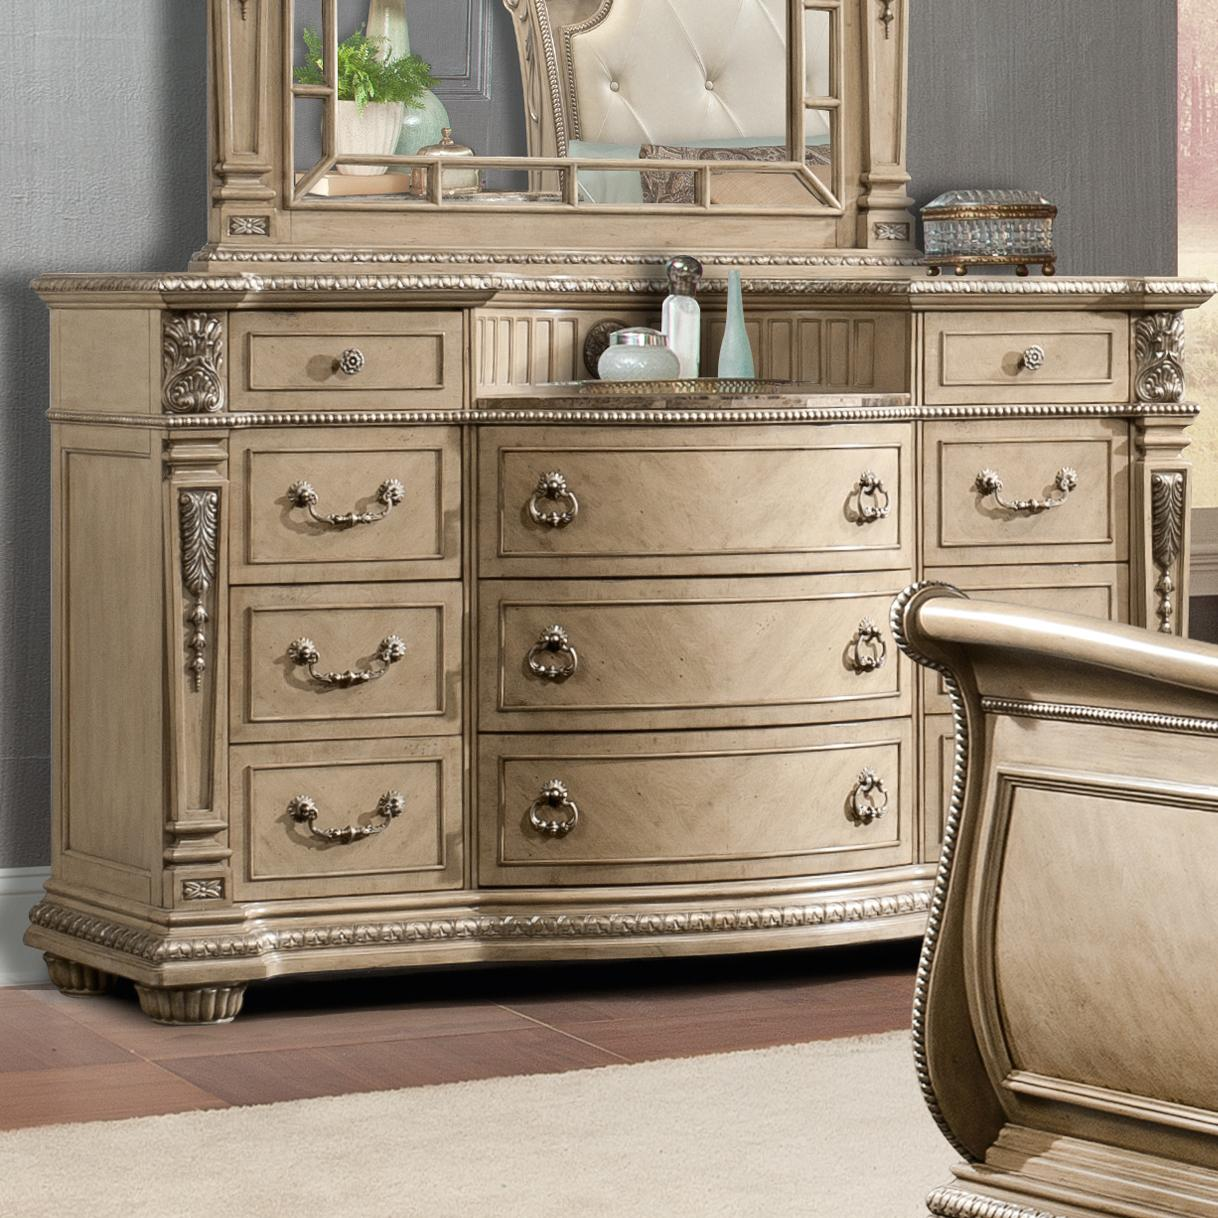 Davis International Bedroom Furniture 11 Drawer Dresser Bestdressers 2017